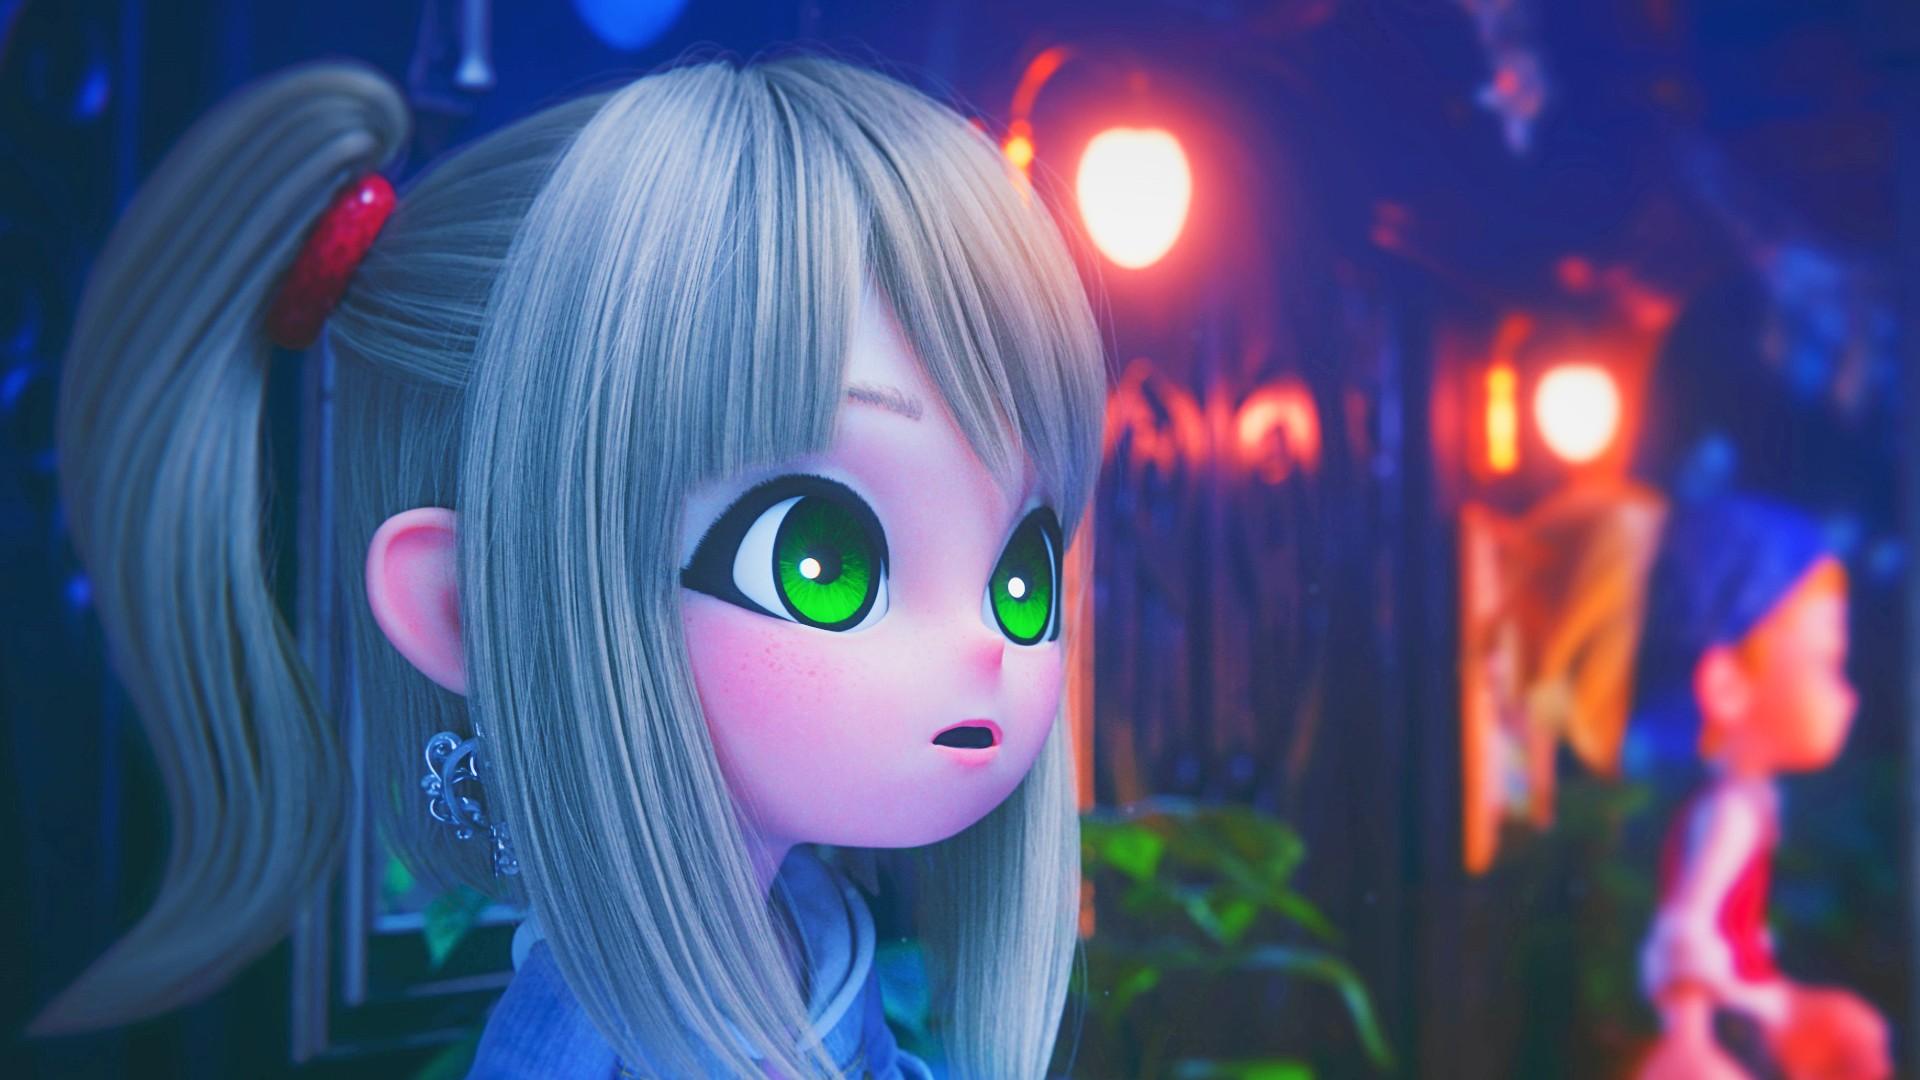 Sonic creator confirms Square Enix departure following Balan Wonderworld launch